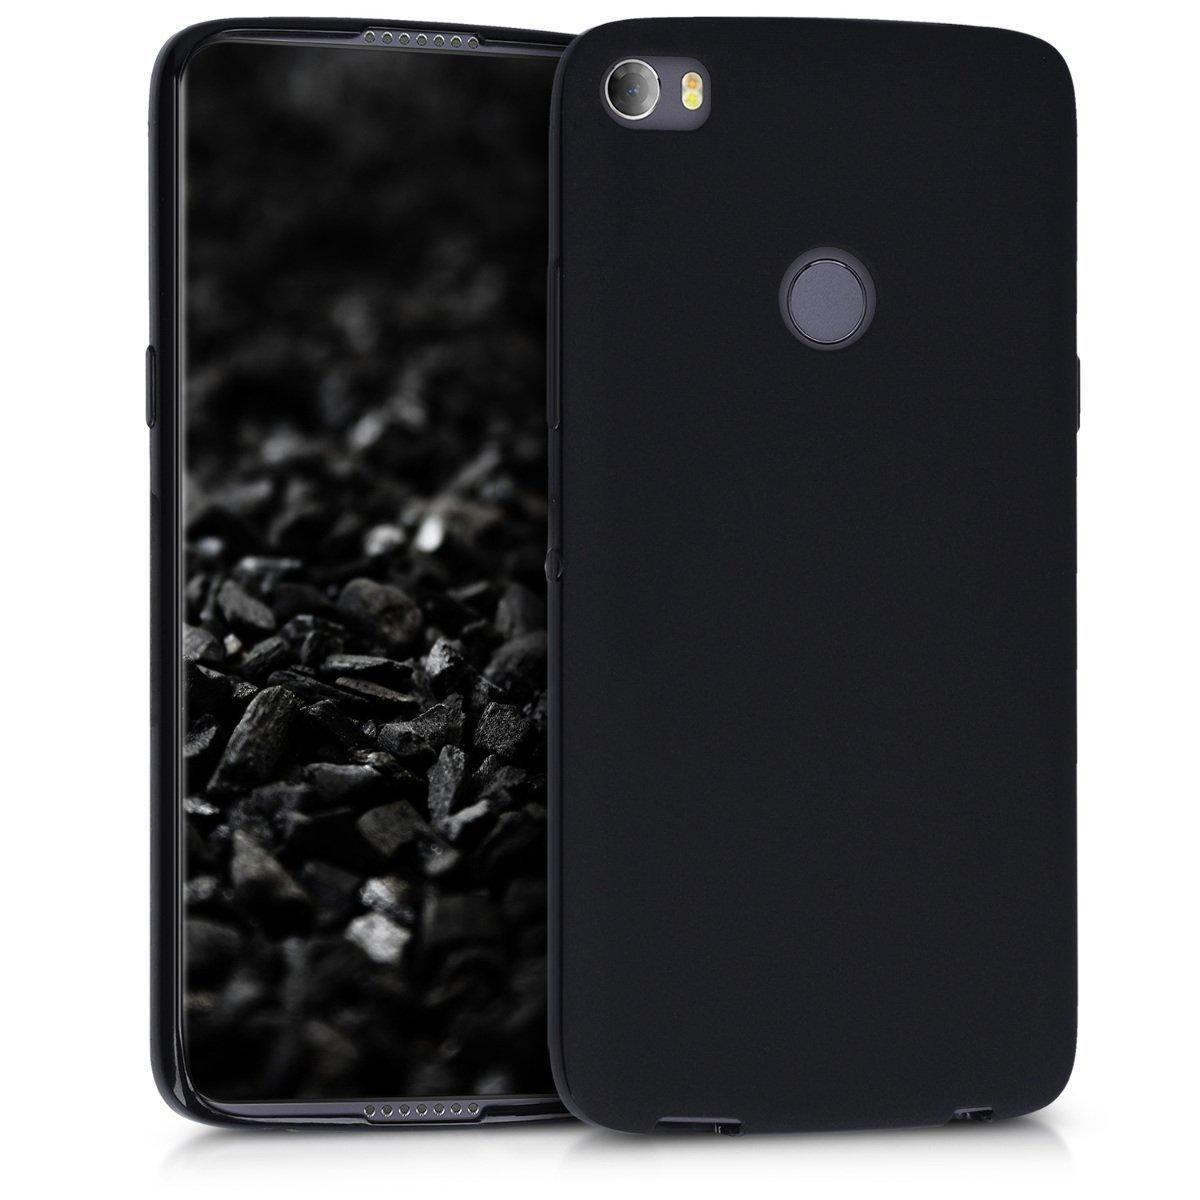 KW Θήκη Σιλικόνης Alcatel Idol 5s - Black Matte (43647.47) θήκες κινητών